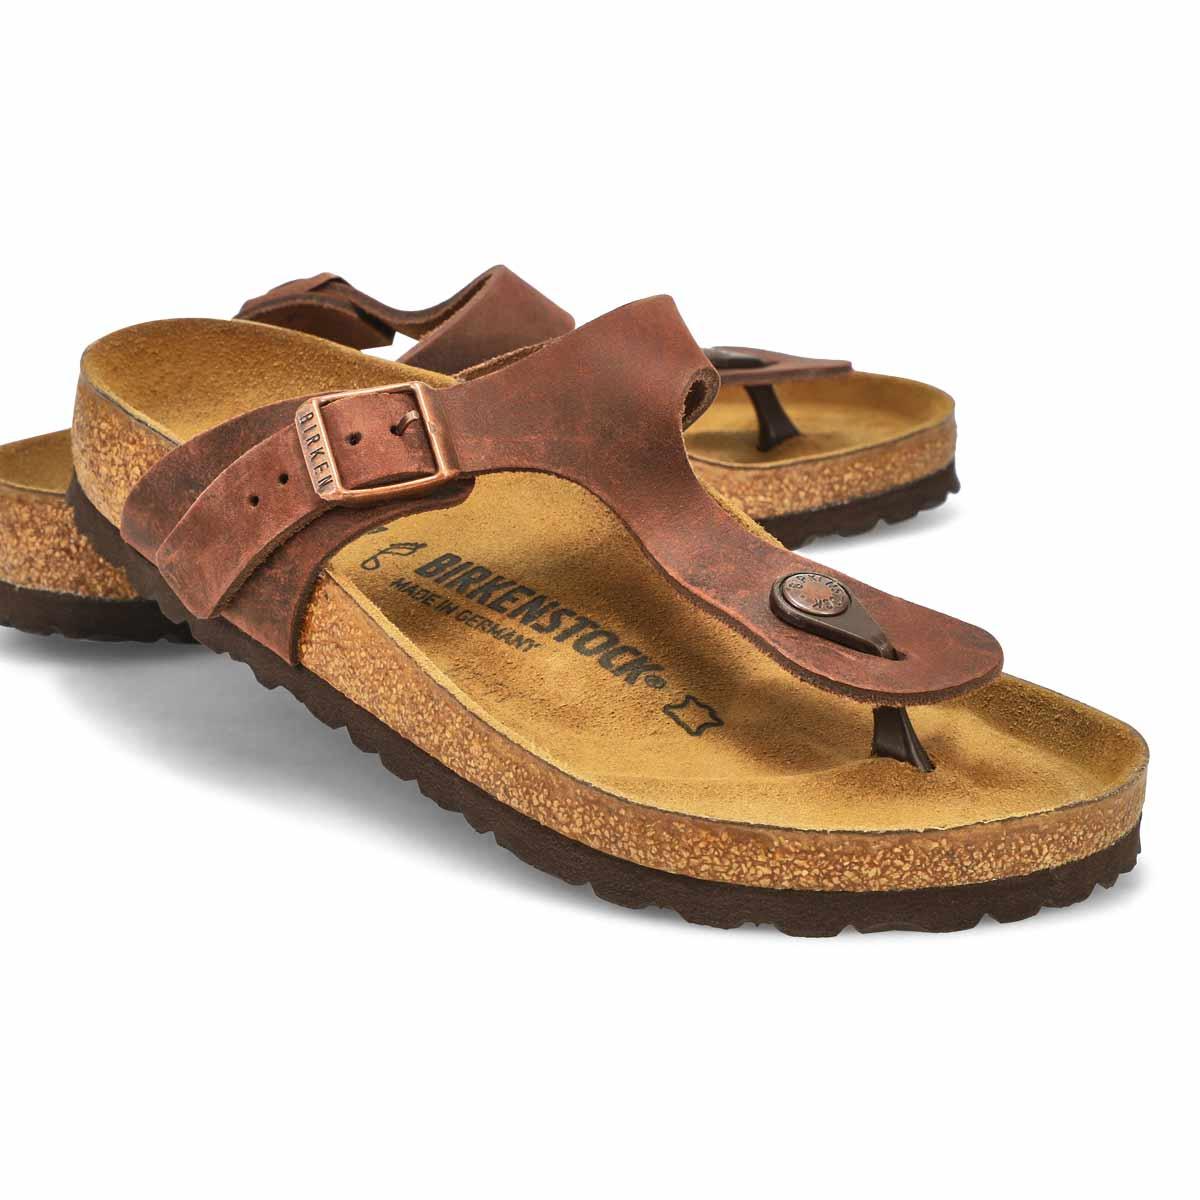 Sandales tongs Gizeh, cuir habane, fem